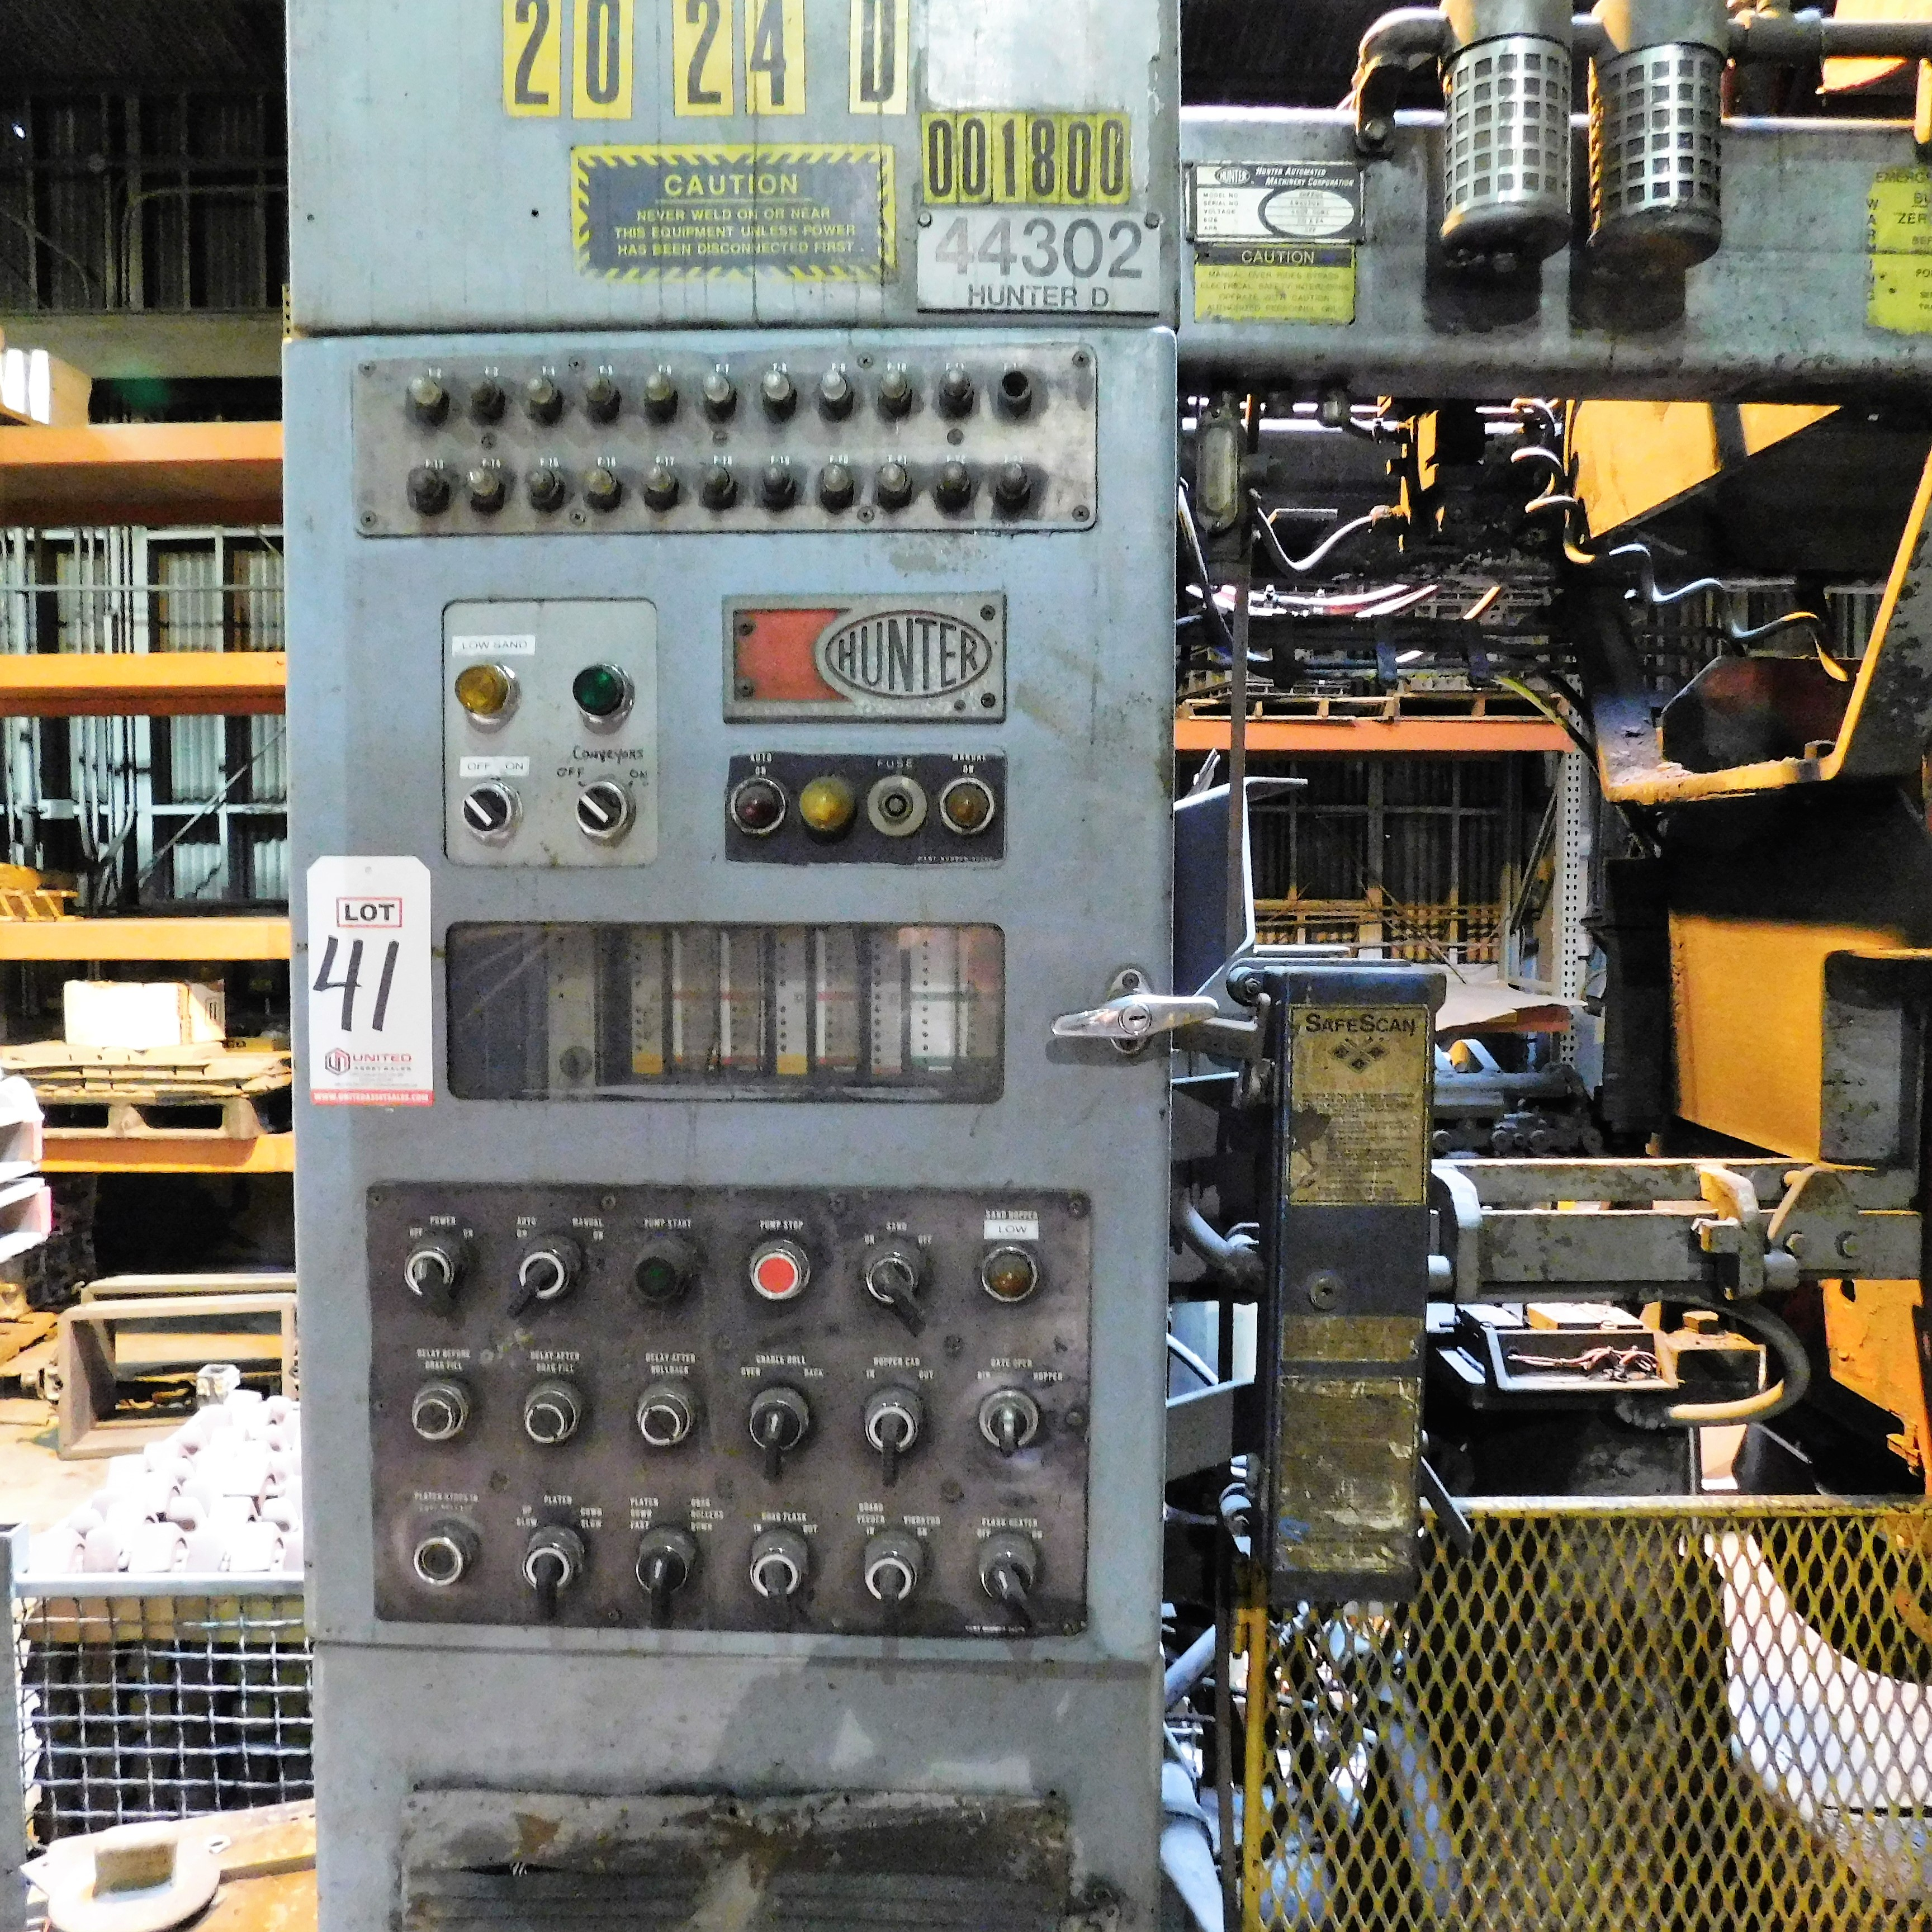 Lot 41 - 1988 HUNTER HMP20C AUTOMATIC MOLDING MACHINE, S/N A88D1010, OPP, W/ LIGHT CURTAIN & PLC CONTROLS